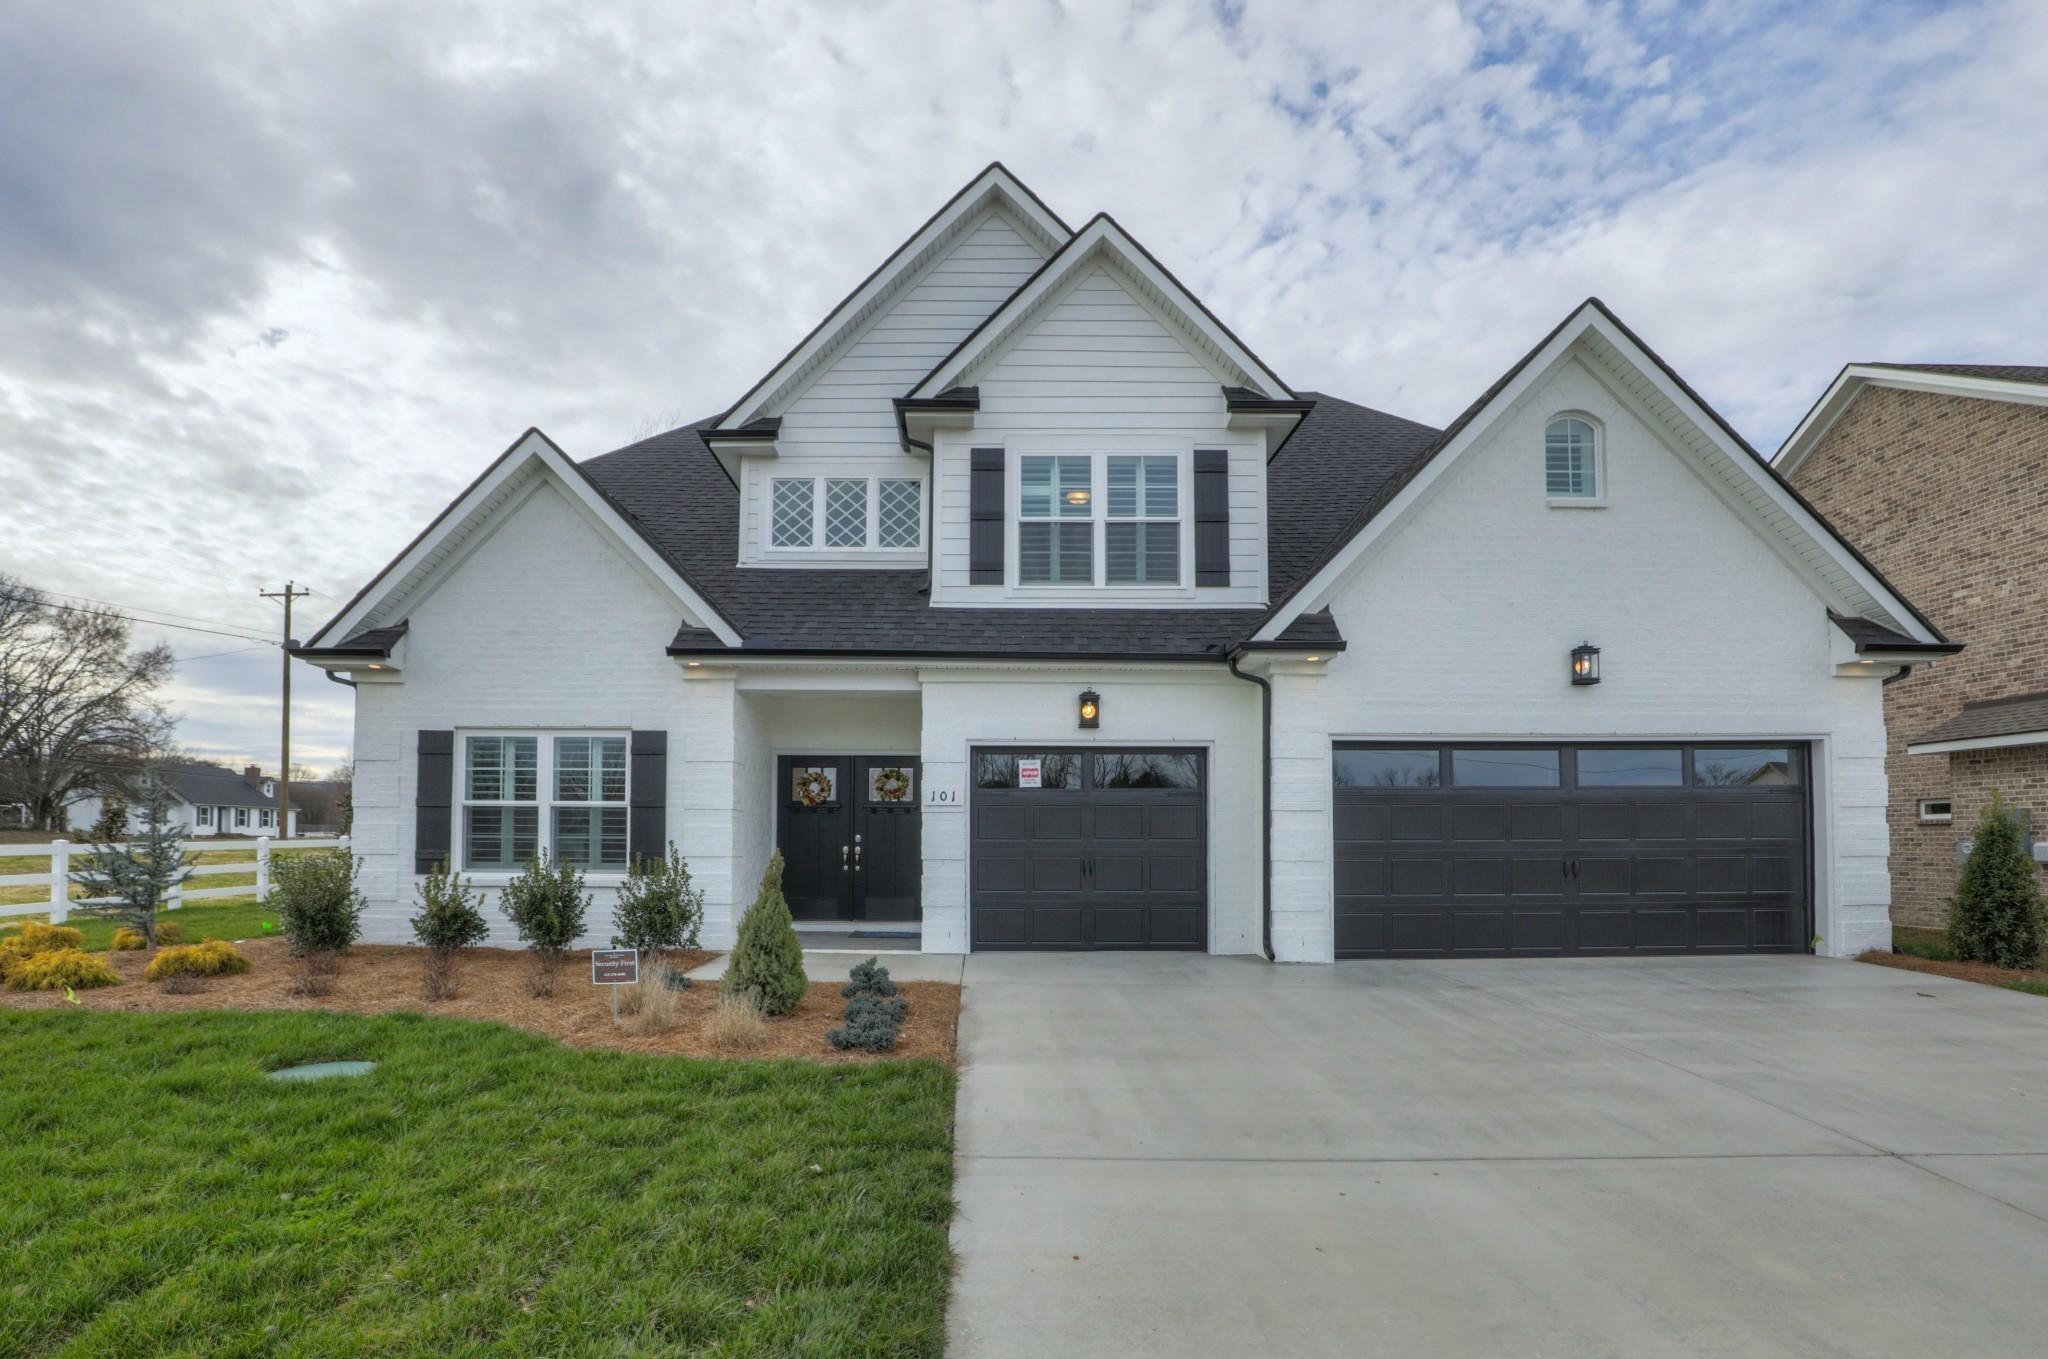 101 Beulah Rose Dr Property Photo - Murfreesboro, TN real estate listing